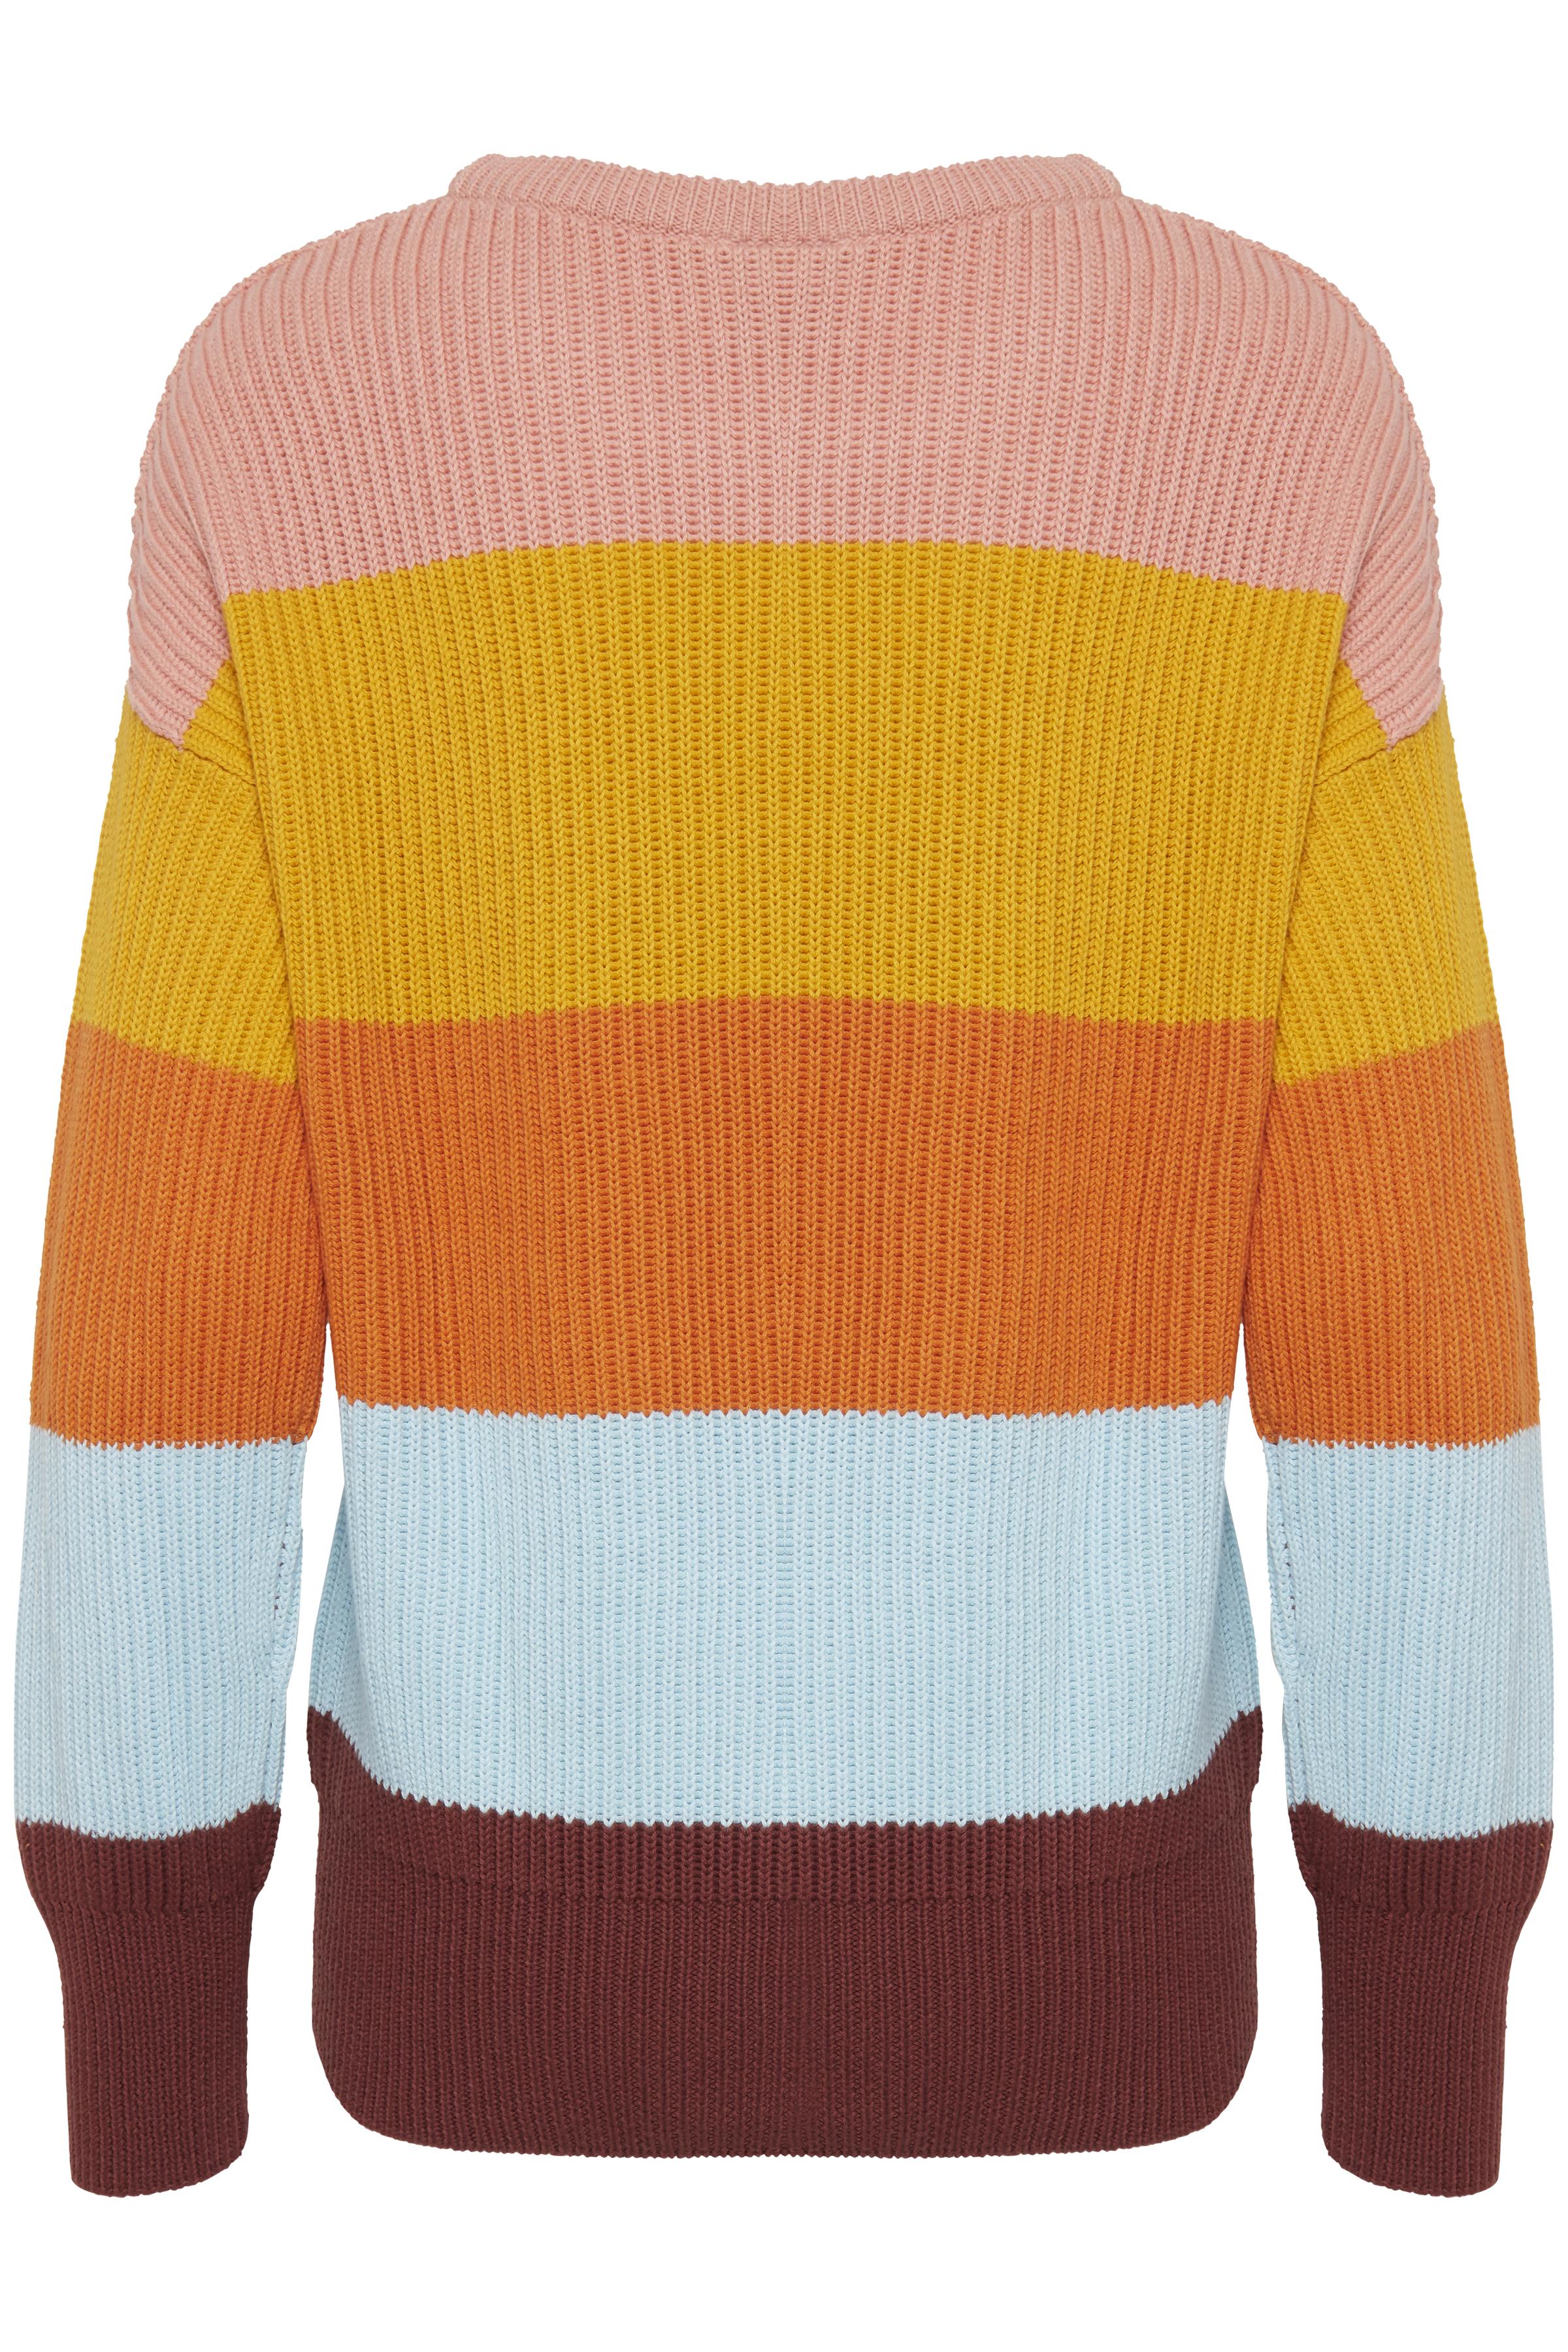 Apple Butter Knitted pullover fra Ichi – Køb Apple Butter Knitted pullover fra str. XS-XL her